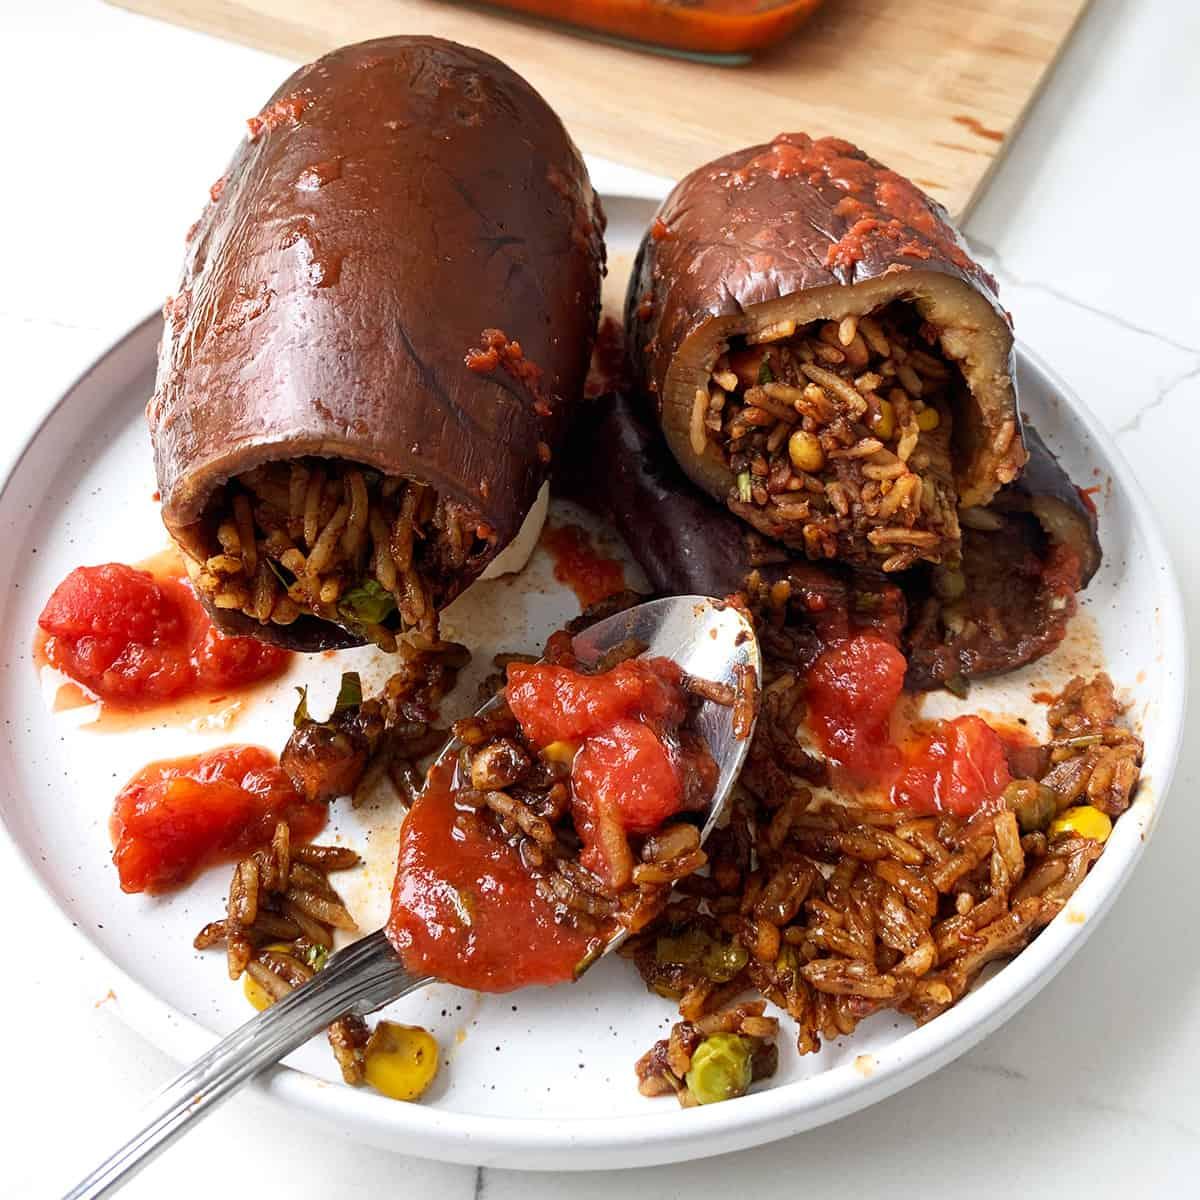 Stuffed Eggplant a Lebanese food recipe known as Batinjan Mahshi